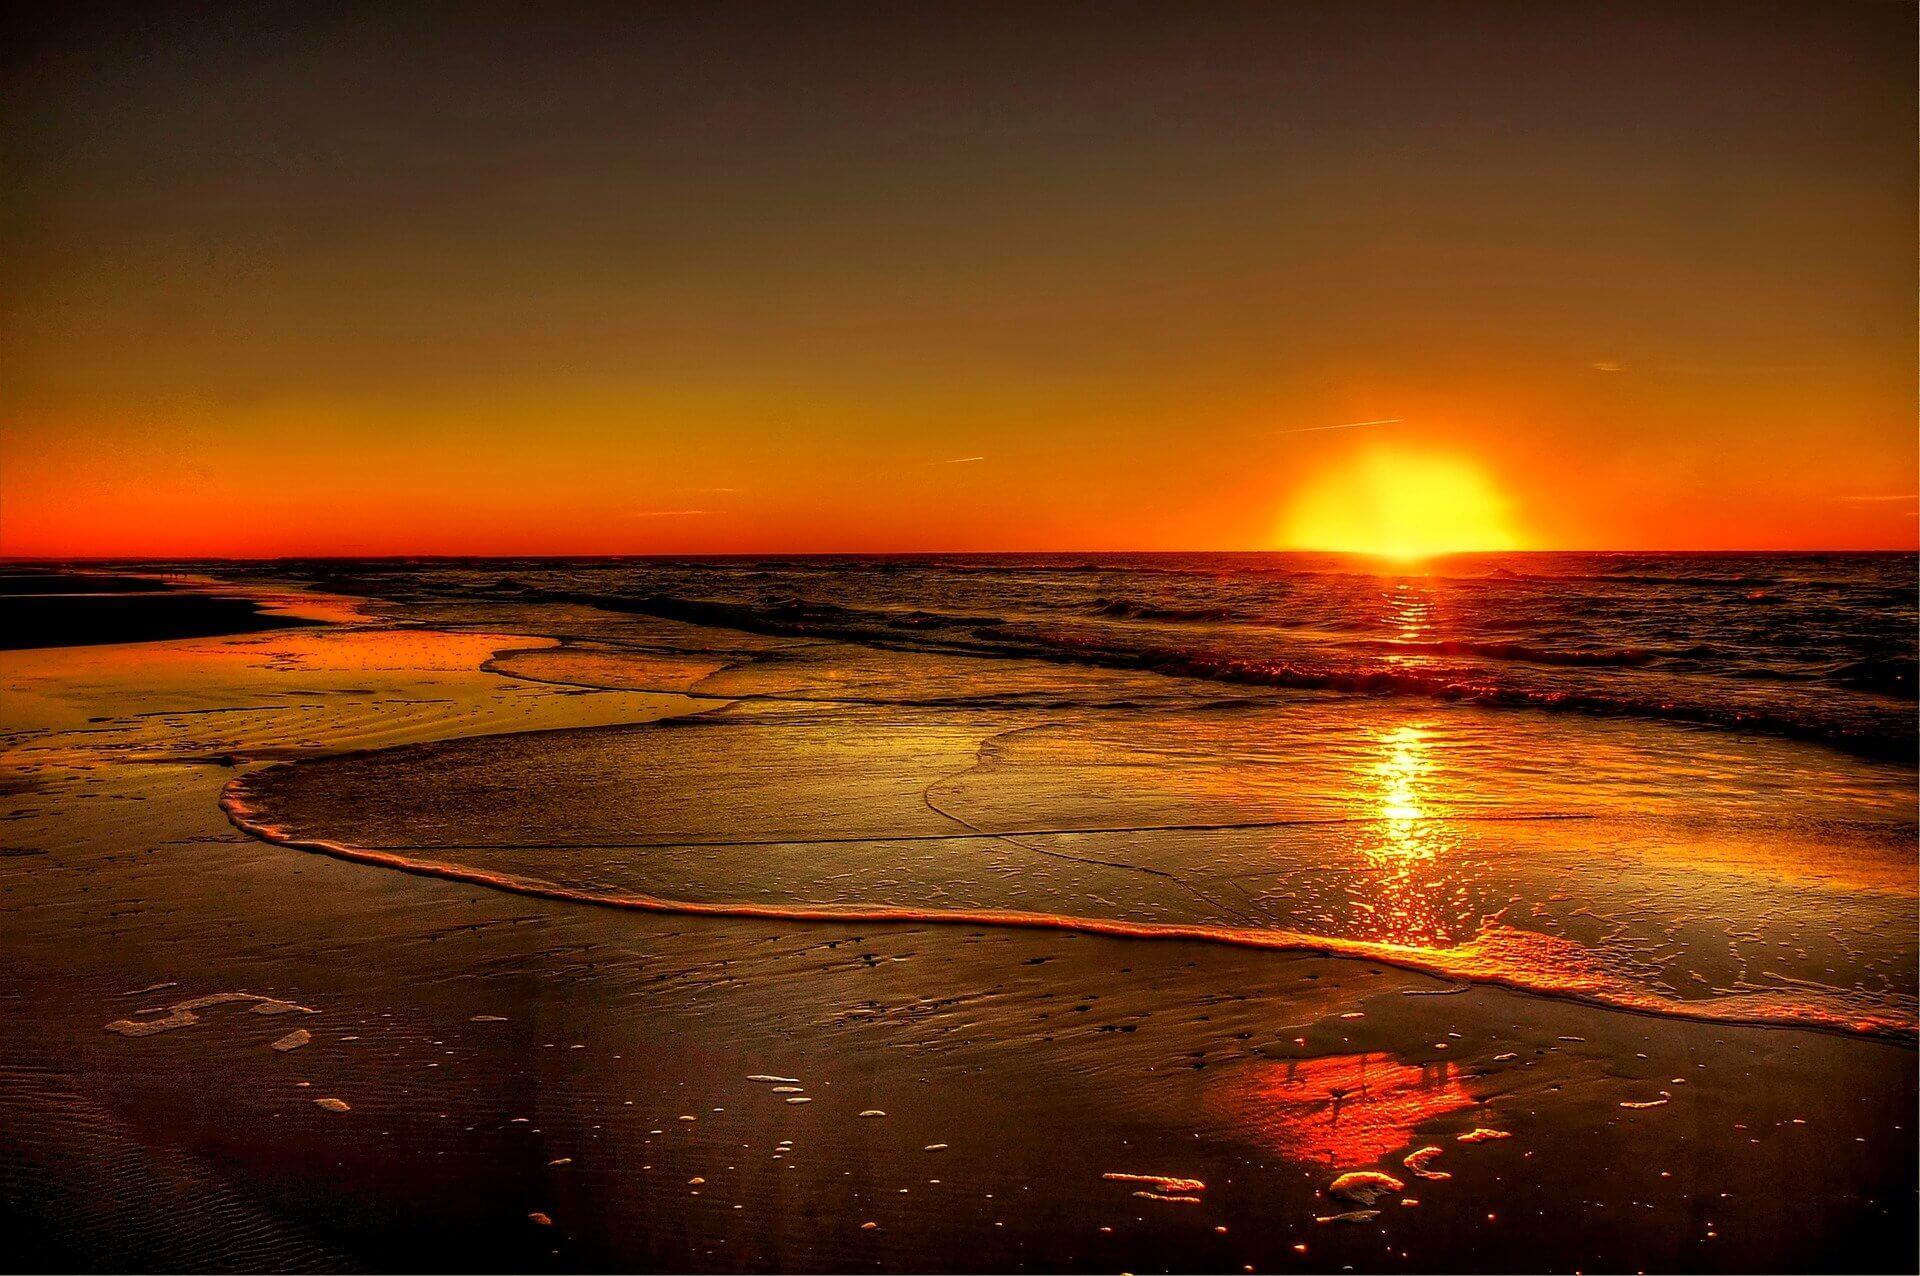 sunset-2210864_1920